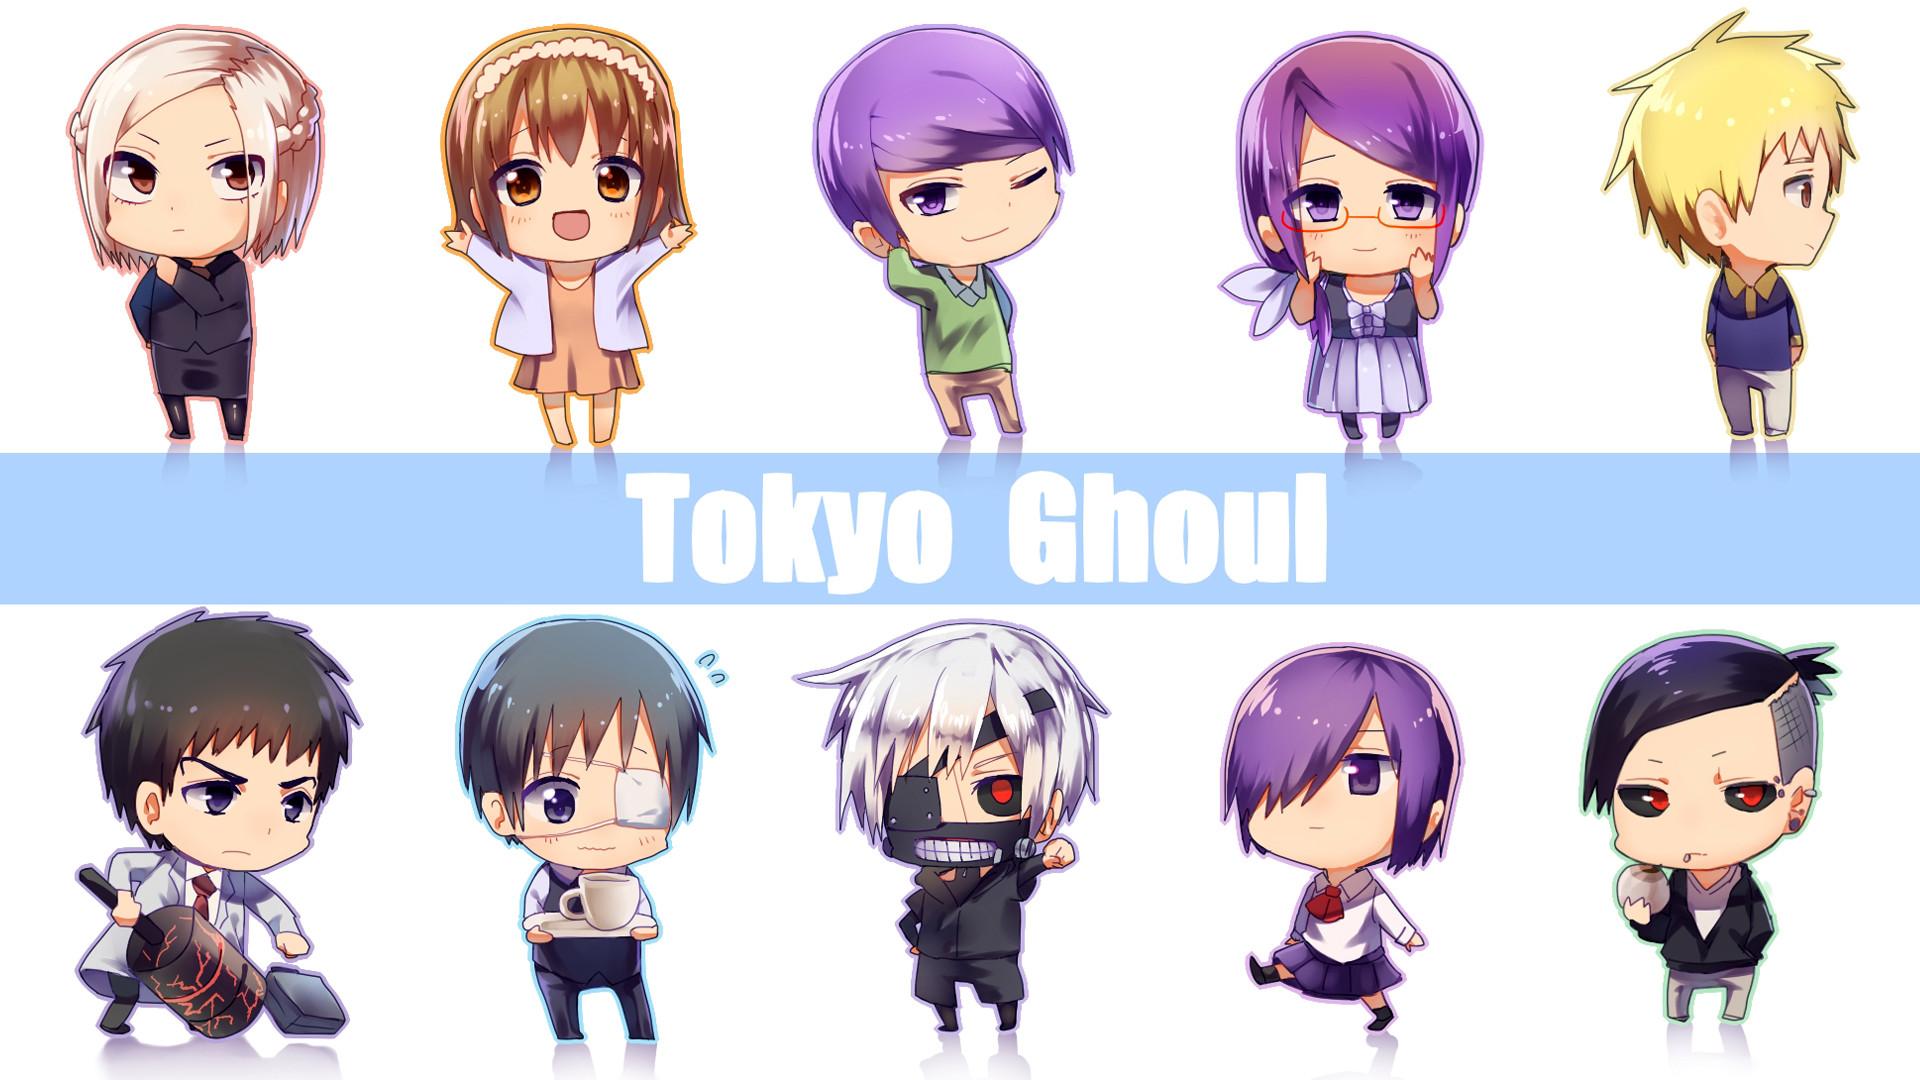 Tokyo Ghoul Chibi Wallpaper bonito do Anime Full HD 1920 × 1080